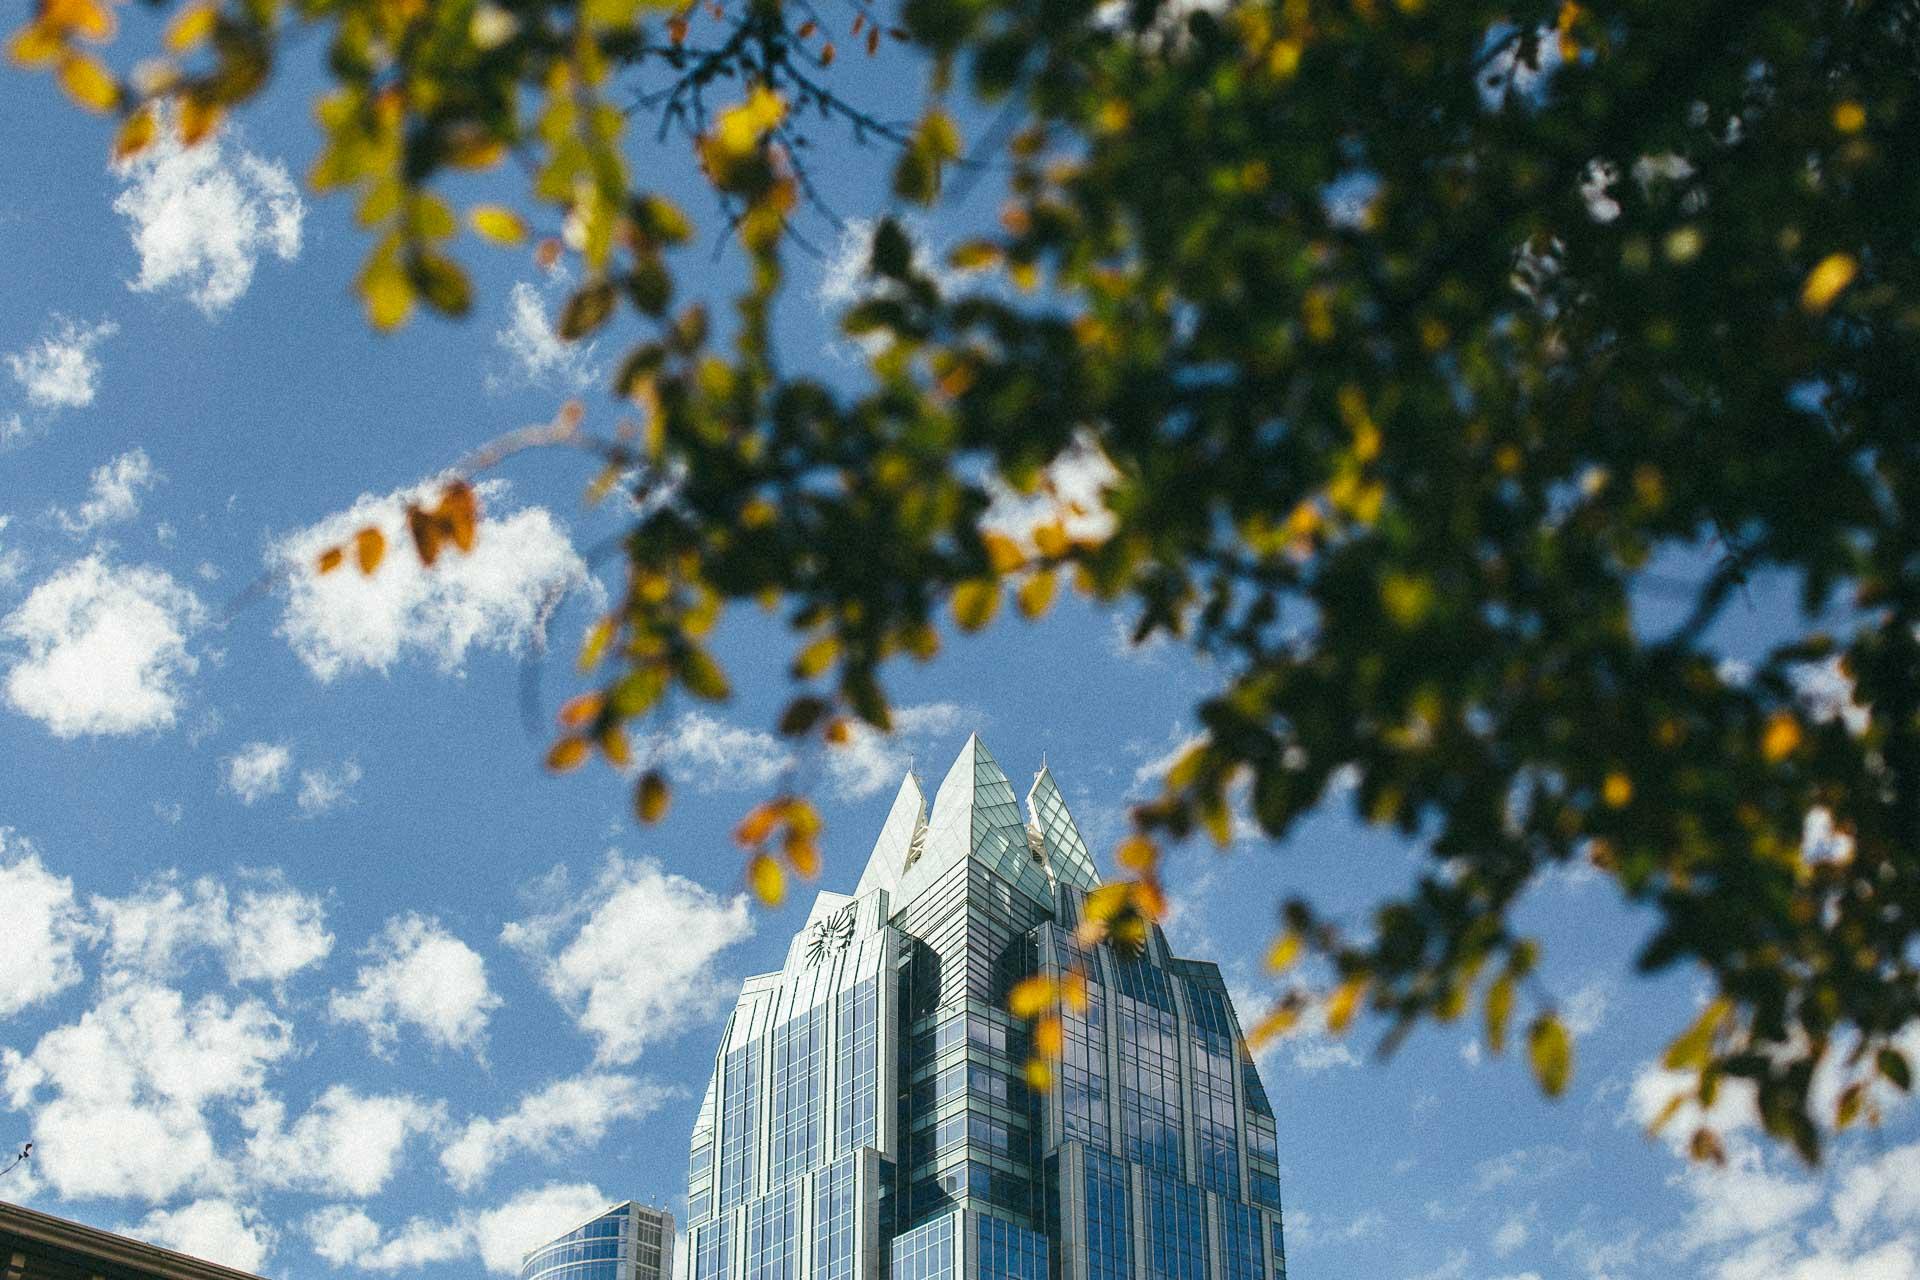 Austin_Texas_JeanLaurentGaudy_001-3